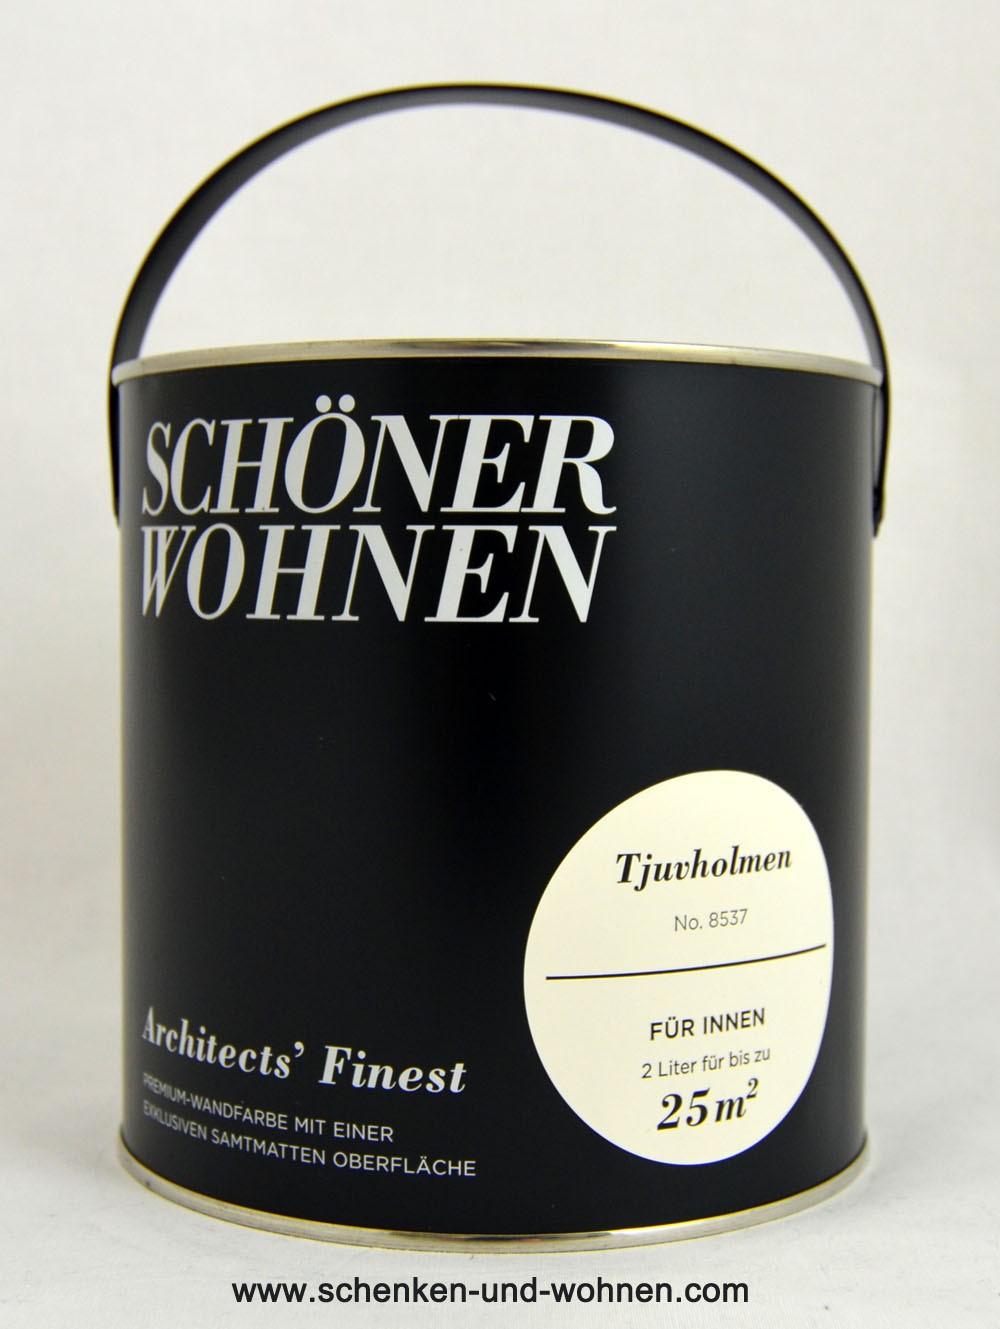 Architects Finest Tjuvholmen 2,0 l samtmatt